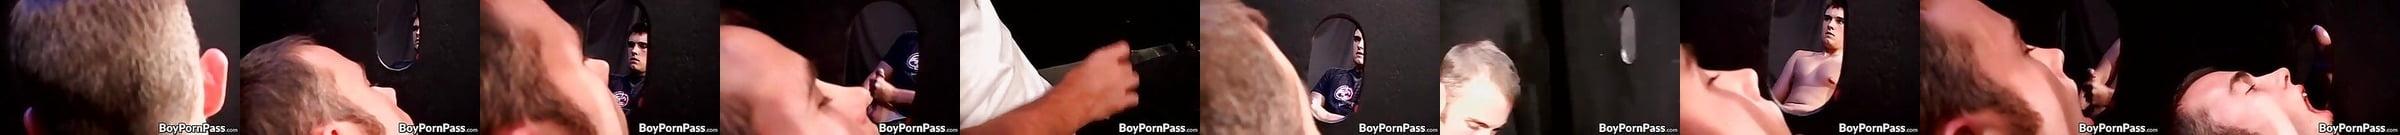 Samenraub Porno